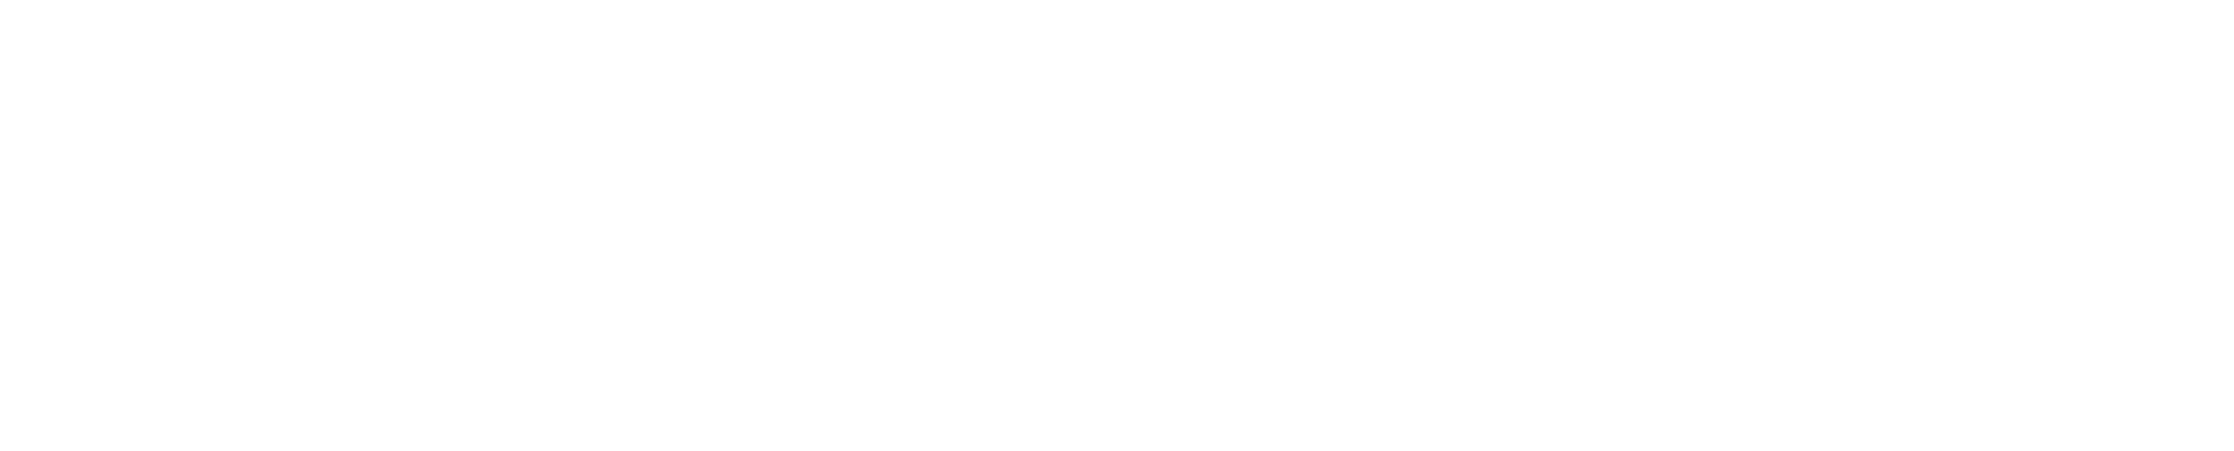 Quantum-wordmark.png